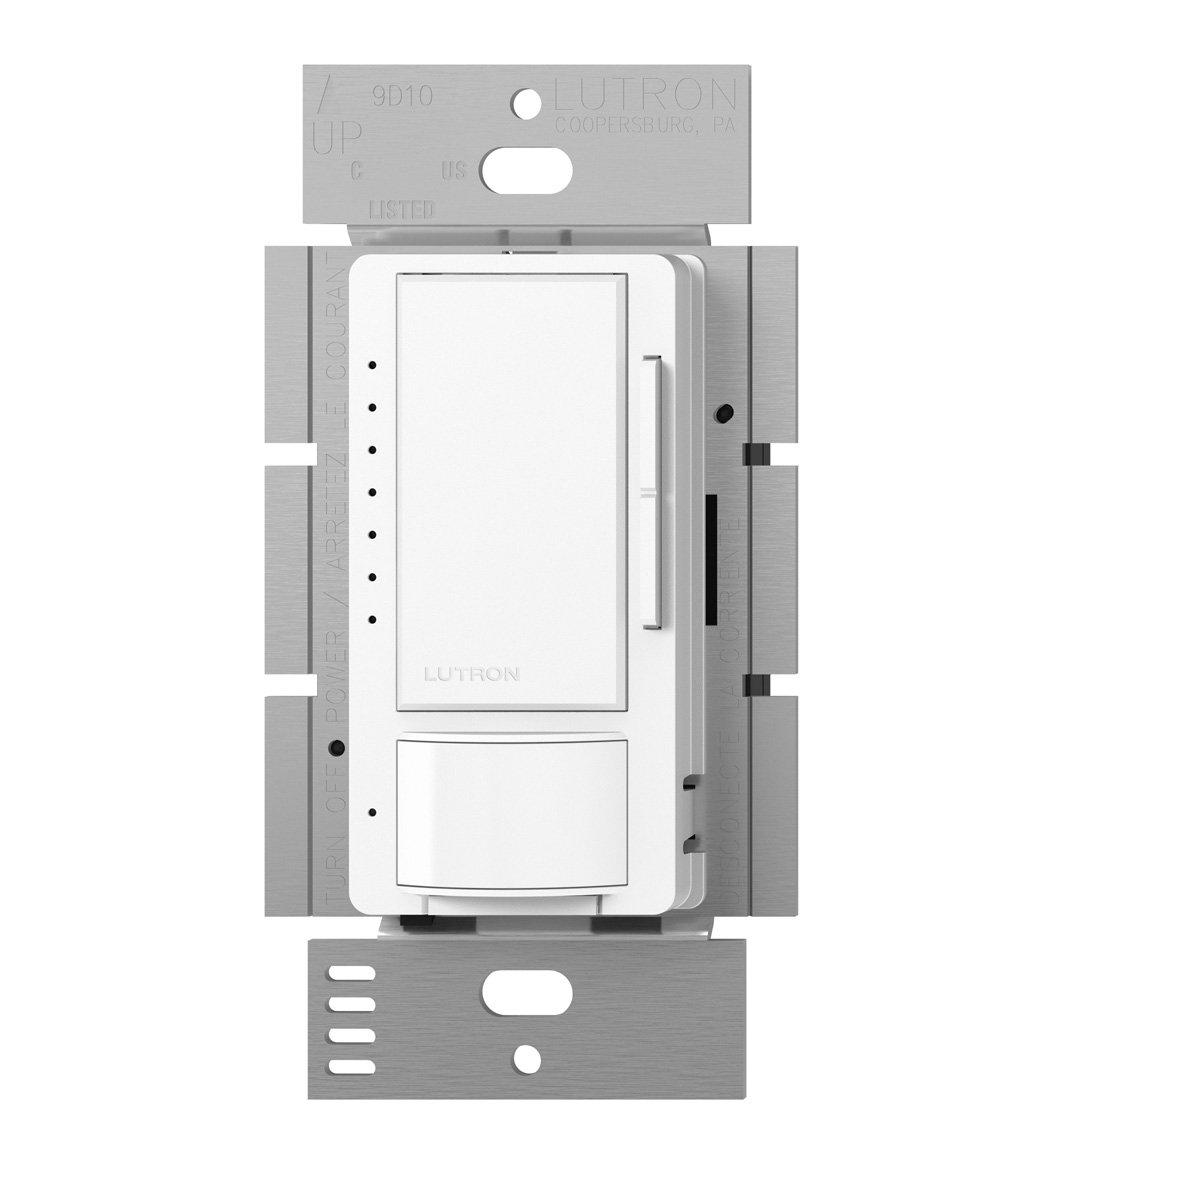 Lutron Maestro CL単極/ multi-location Vacancy Sensingディマー MSCL-VP153M-WH 1 B00ECUH40I ホワイト ホワイト